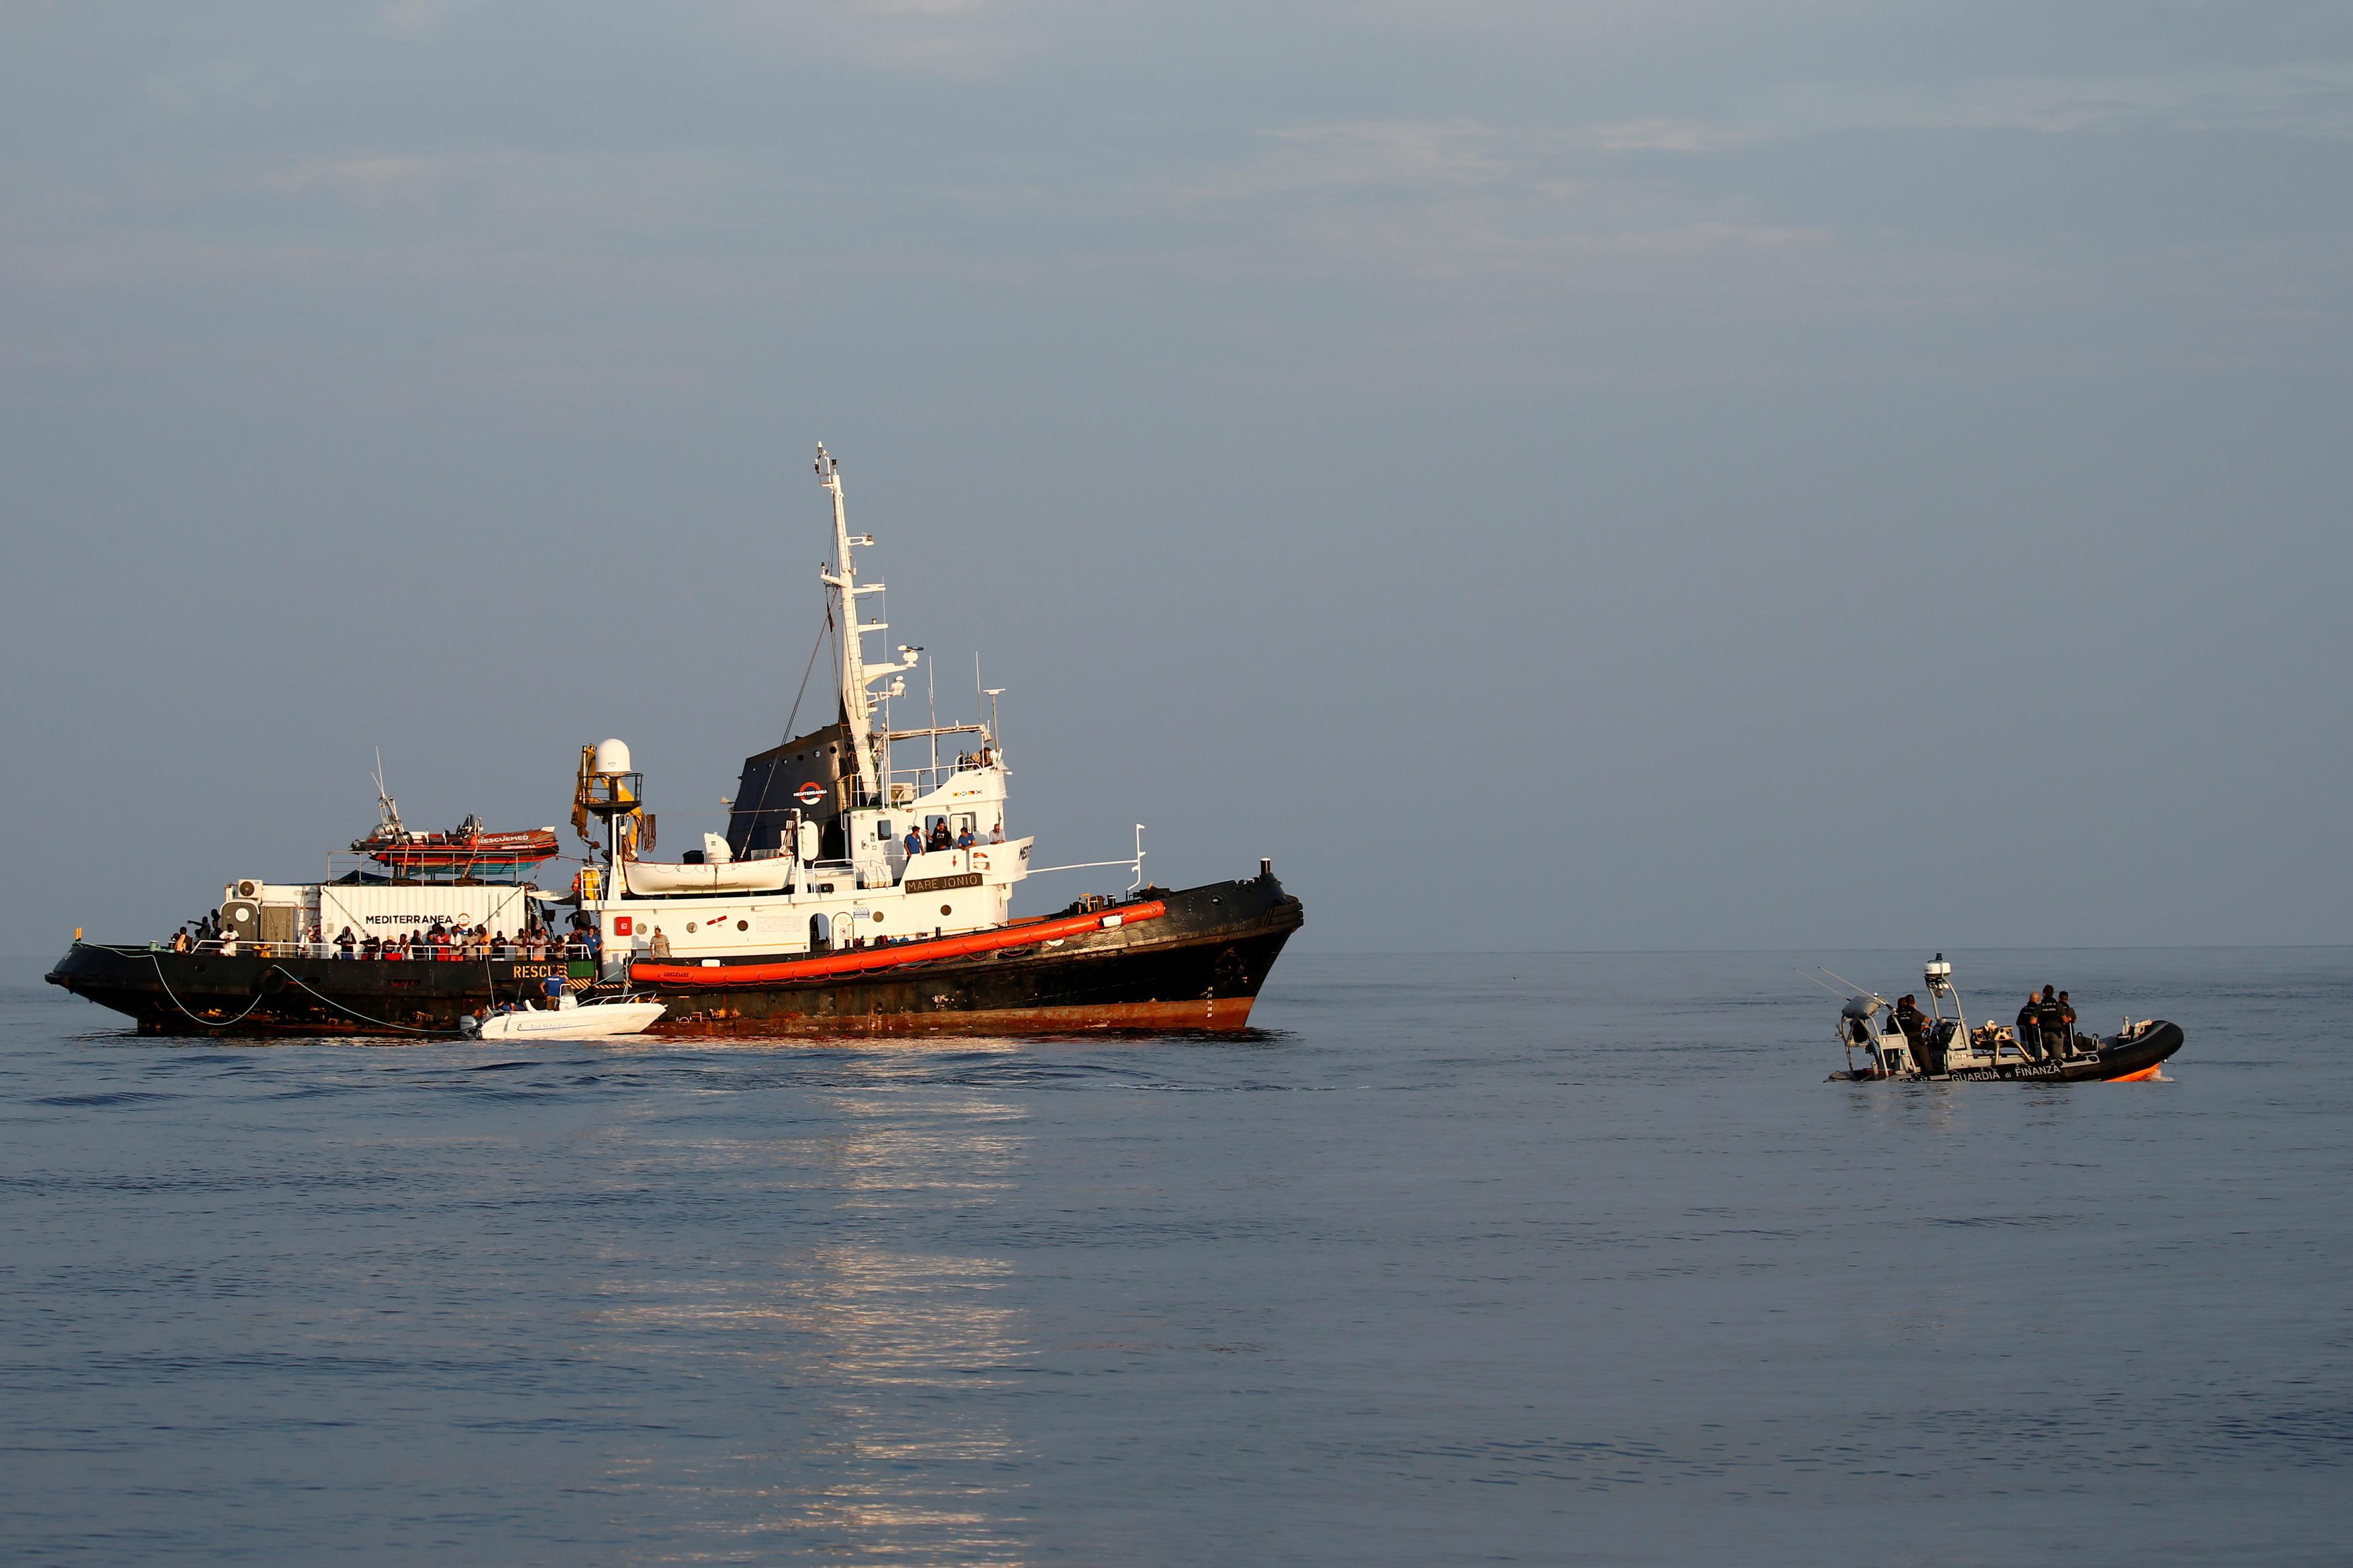 A rigid-hulled inflatable boat (RHIB) of the Italian Finance Police patrols near the Mare Jonio, operated by Italian charity Mediterranea Saving Humans, and the German NGO Sea-Eye migrant rescue ship 'Alan Kurdi' (unseen).  REUTERS/Darrin Zammit Lupi